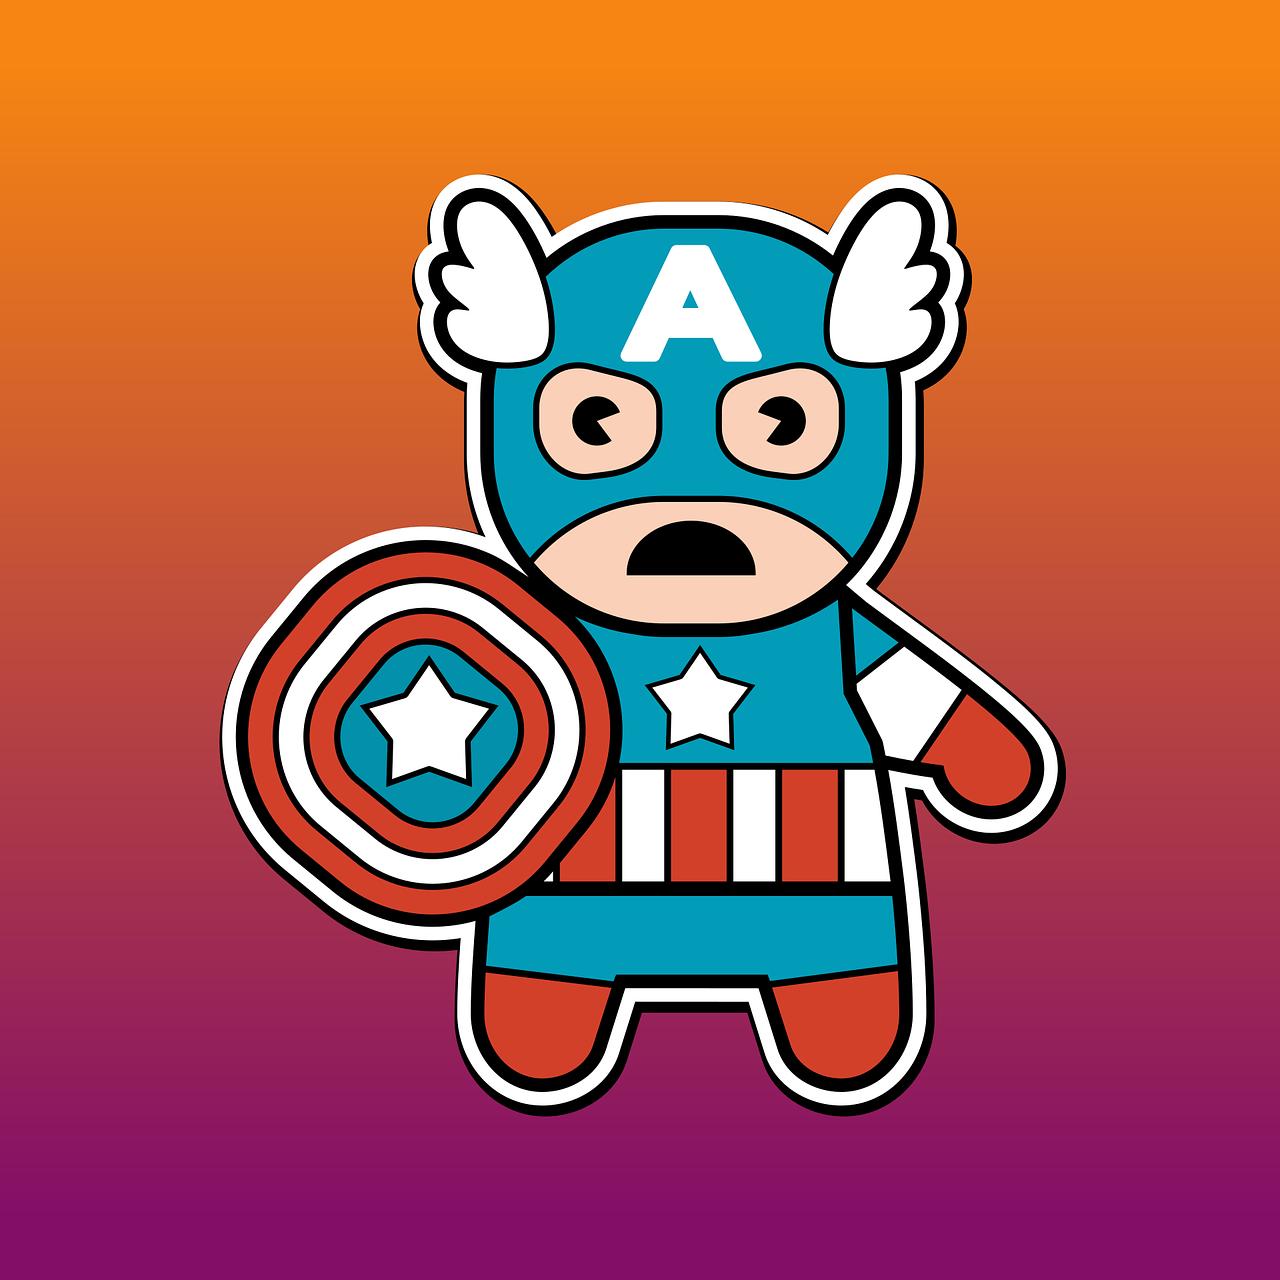 Sketsa Lucu Karakter Gambar Vektor Gratis Di Pixabay